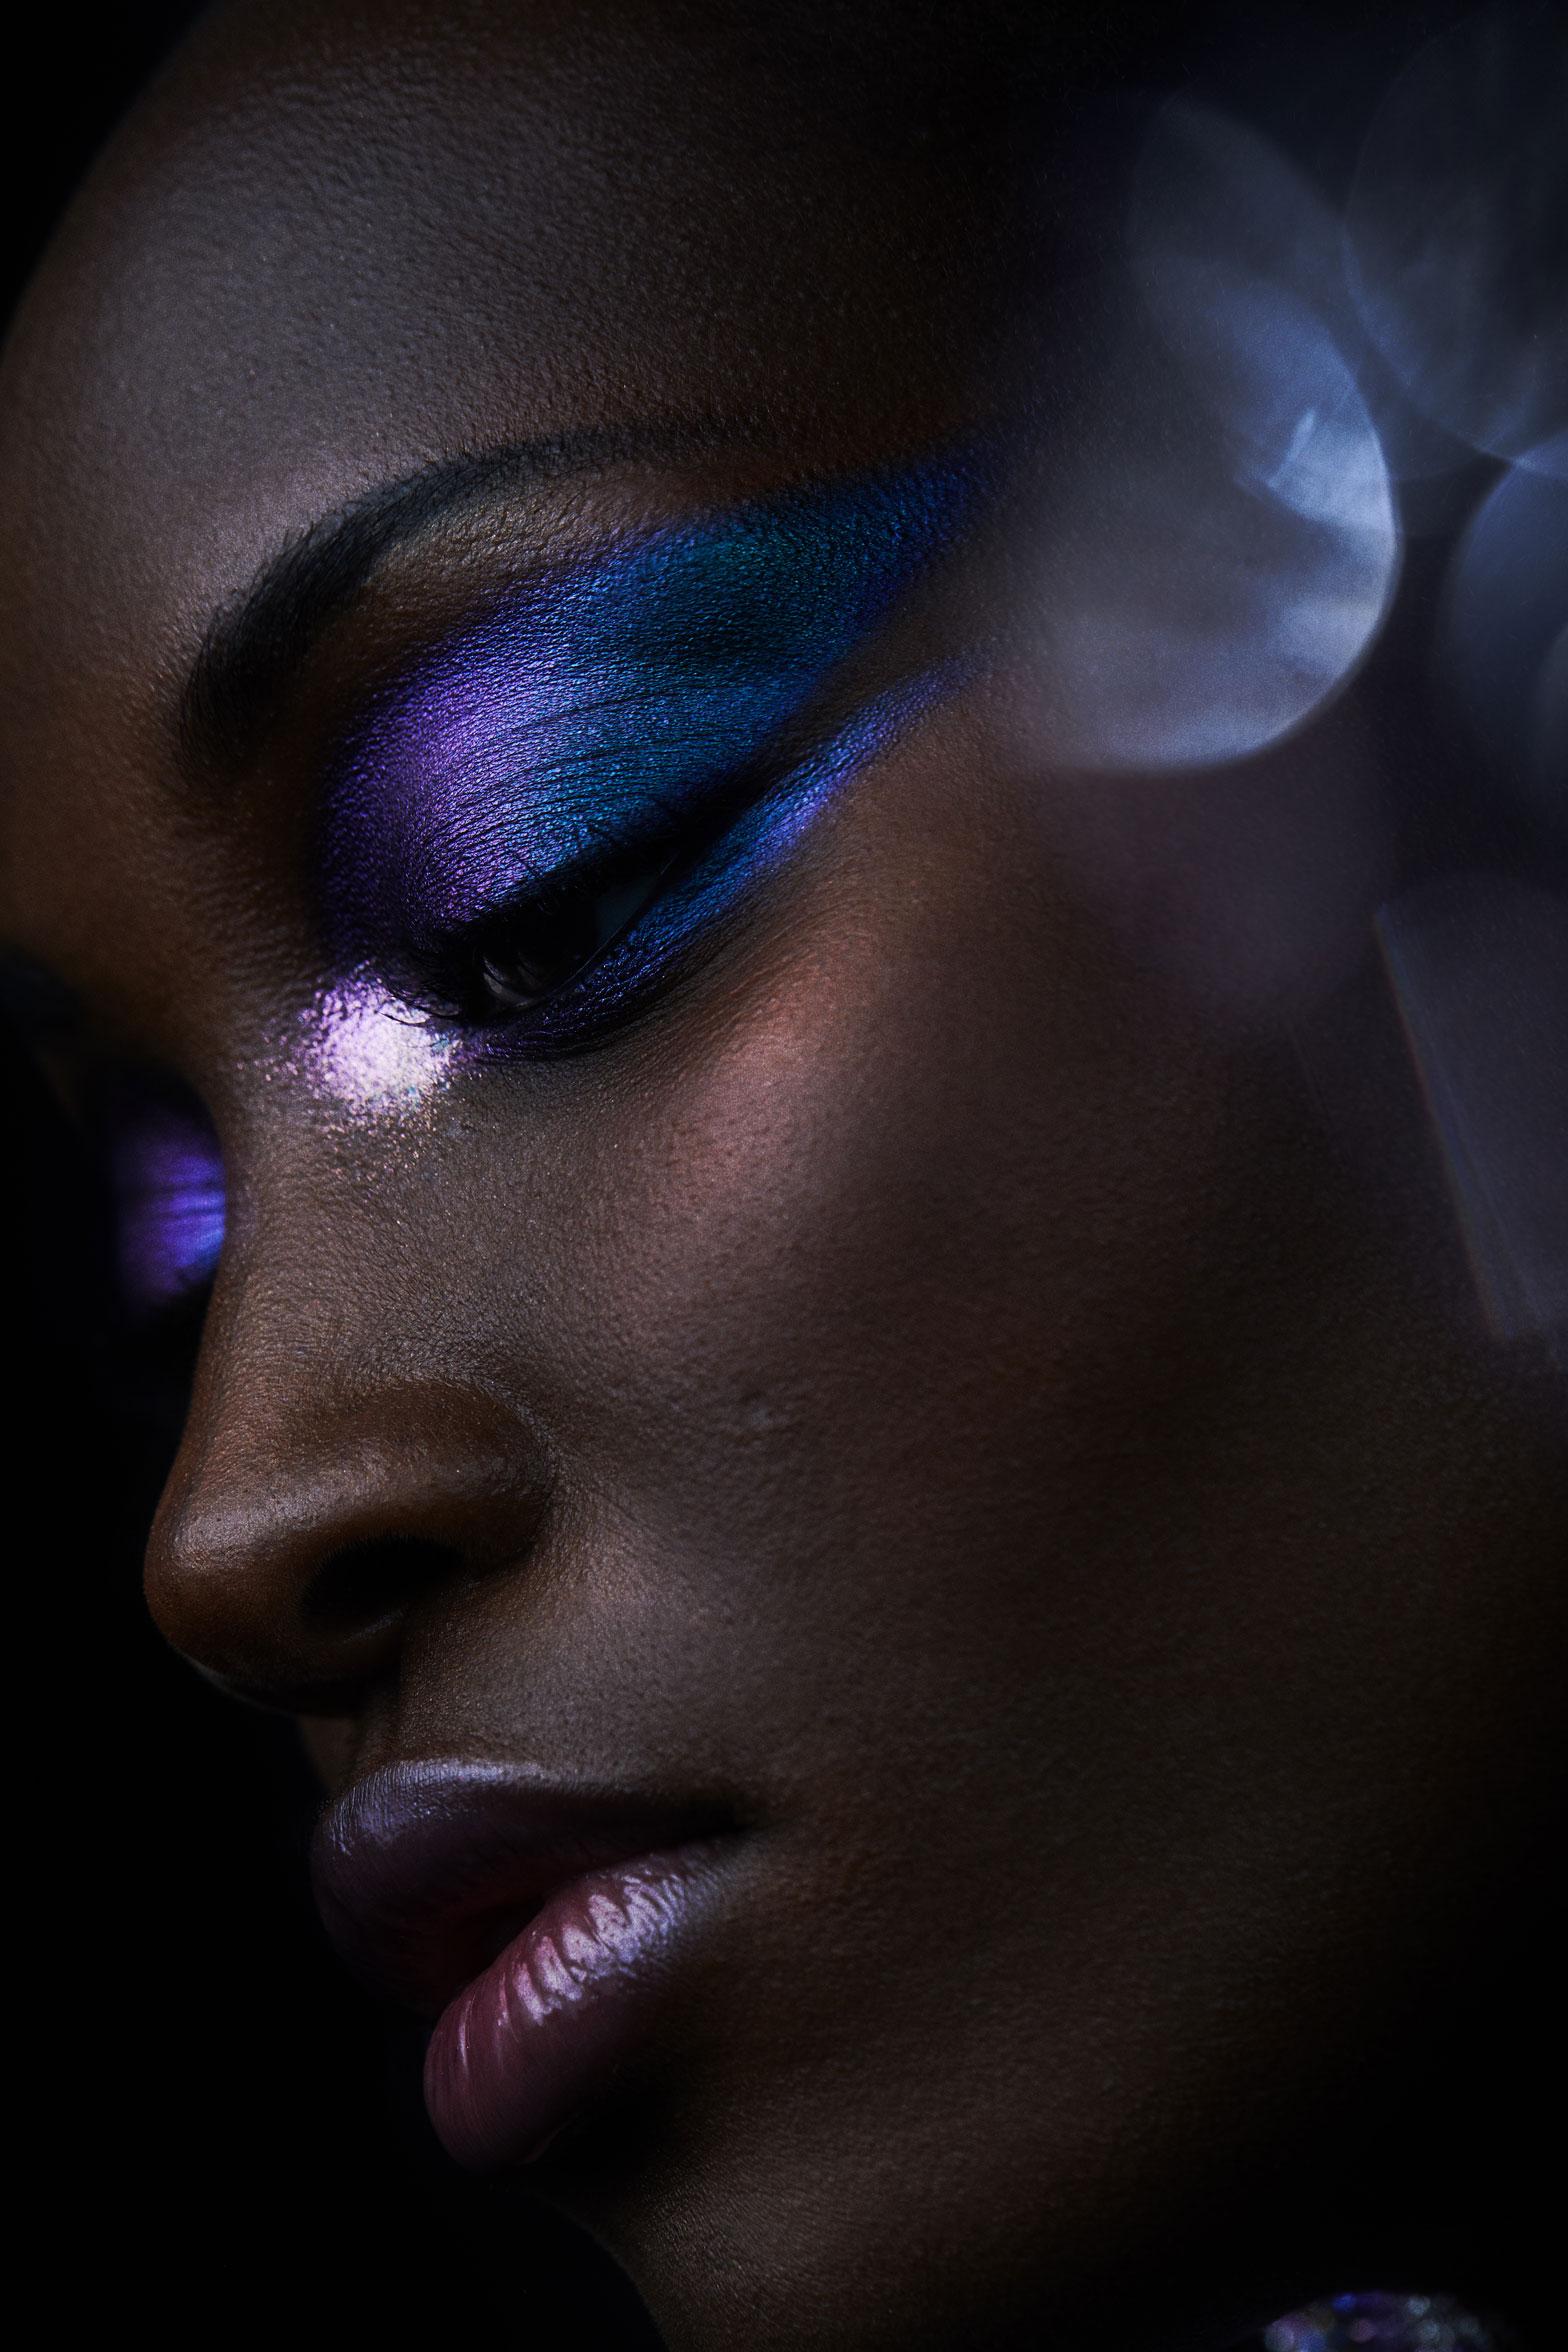 Beauty editorial photography using purple cosmetics